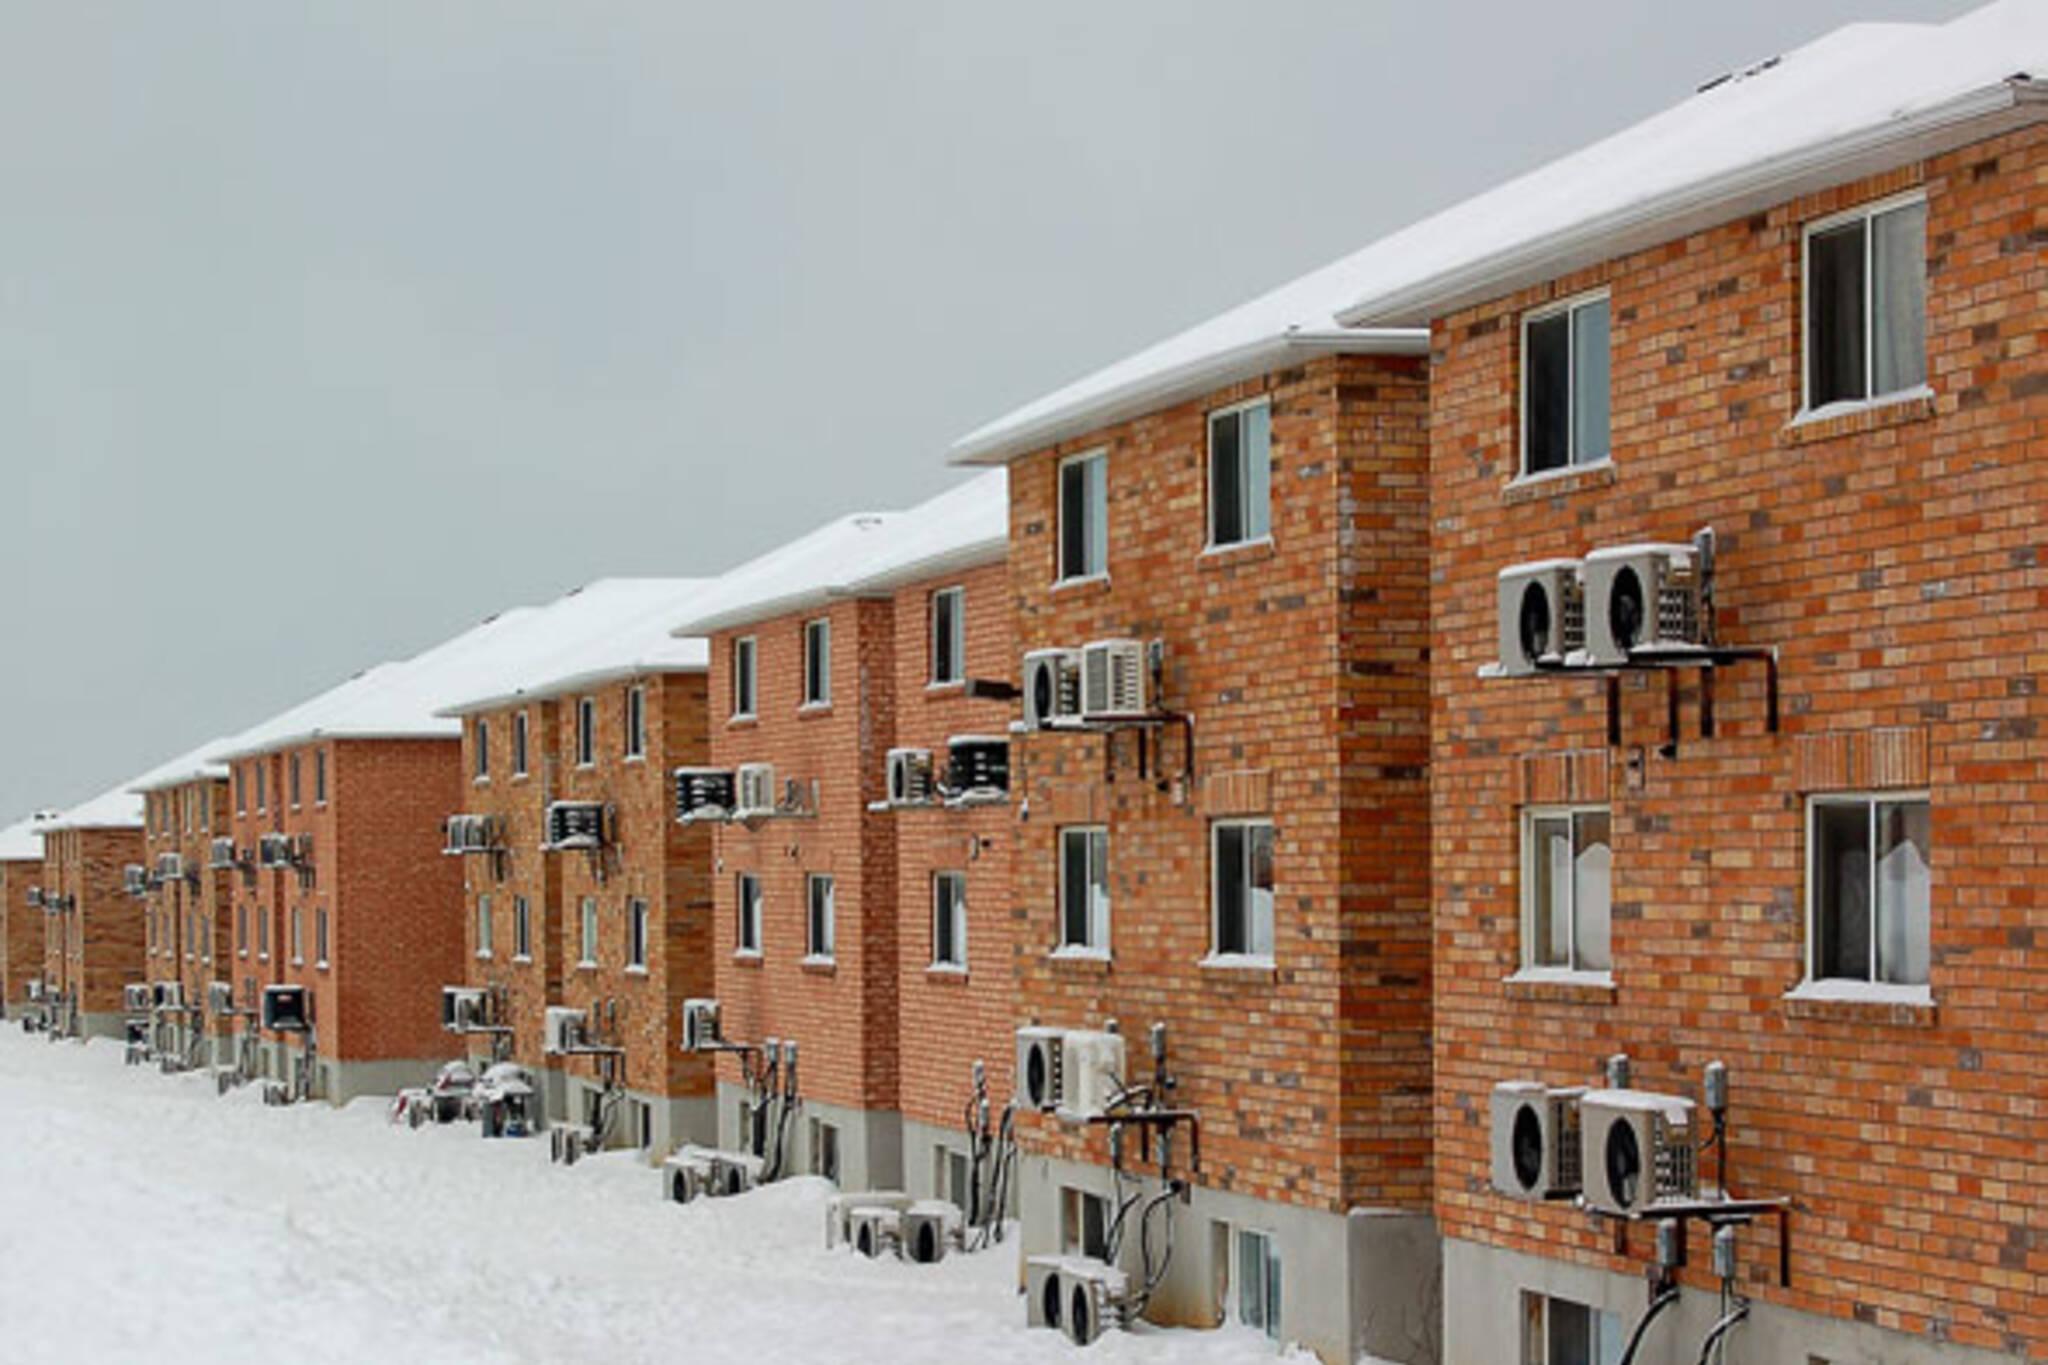 houses on lansdowne